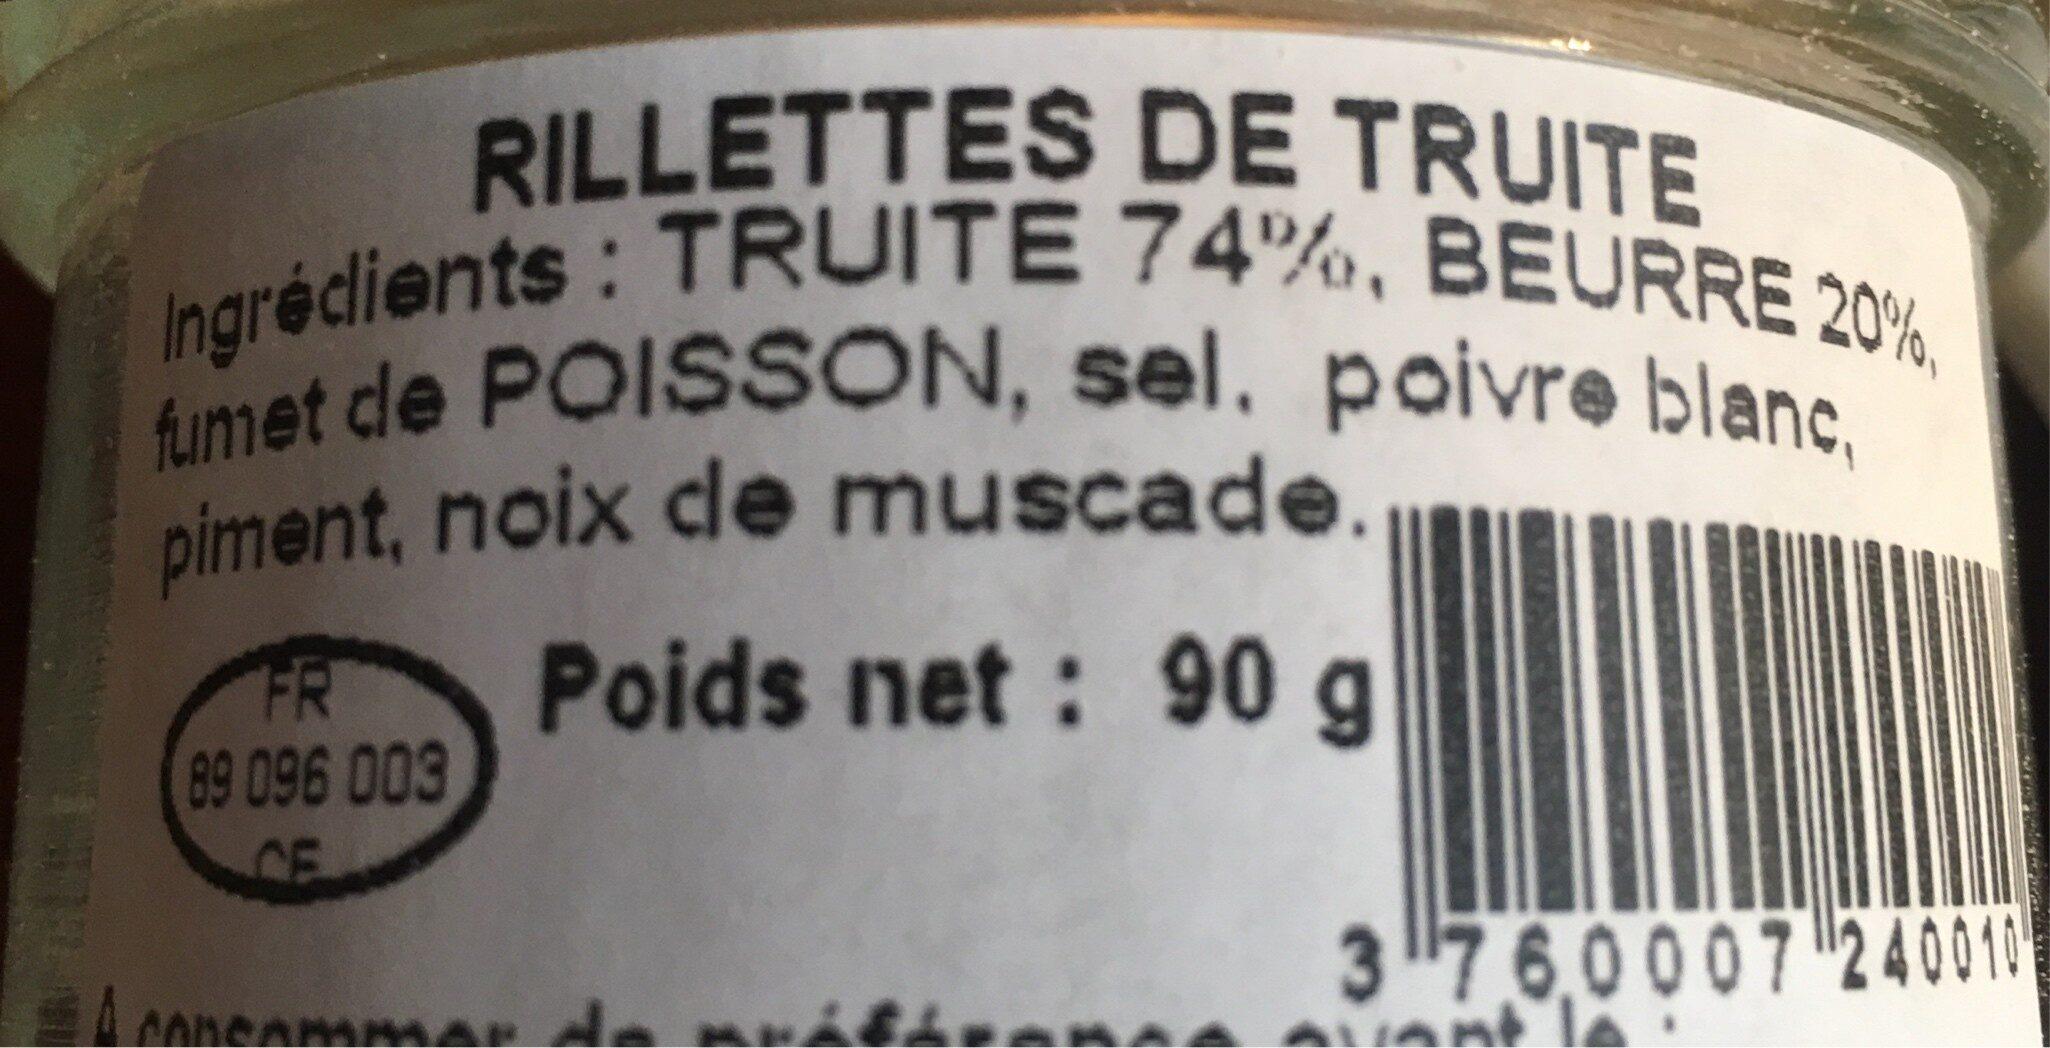 Rillette de truite - Ingrediënten - fr